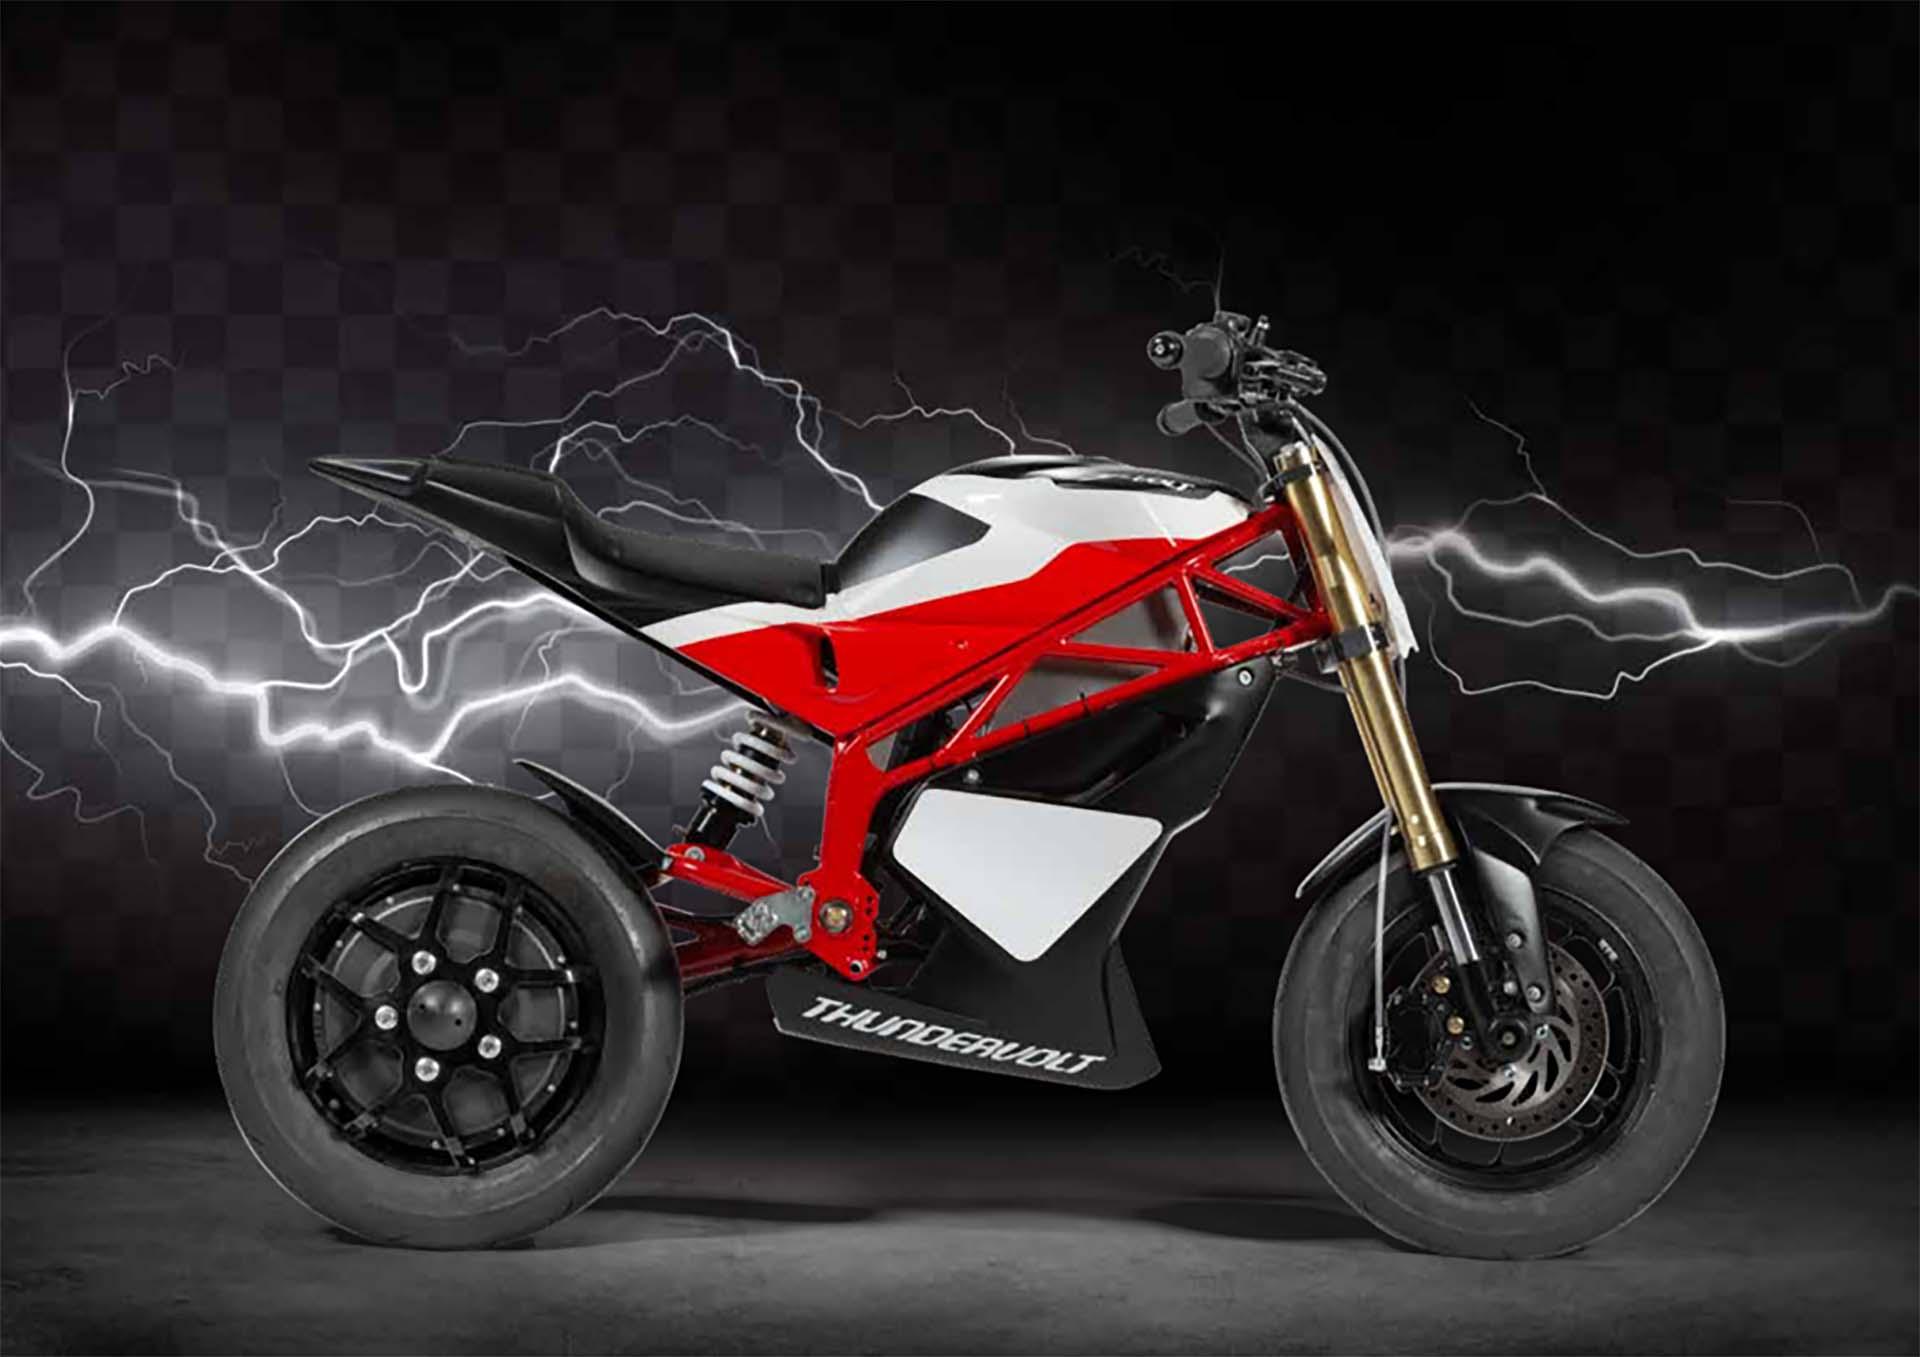 Thundervolt NK-E di Loris Reggiani, la mini moto elettrica, novità 2019